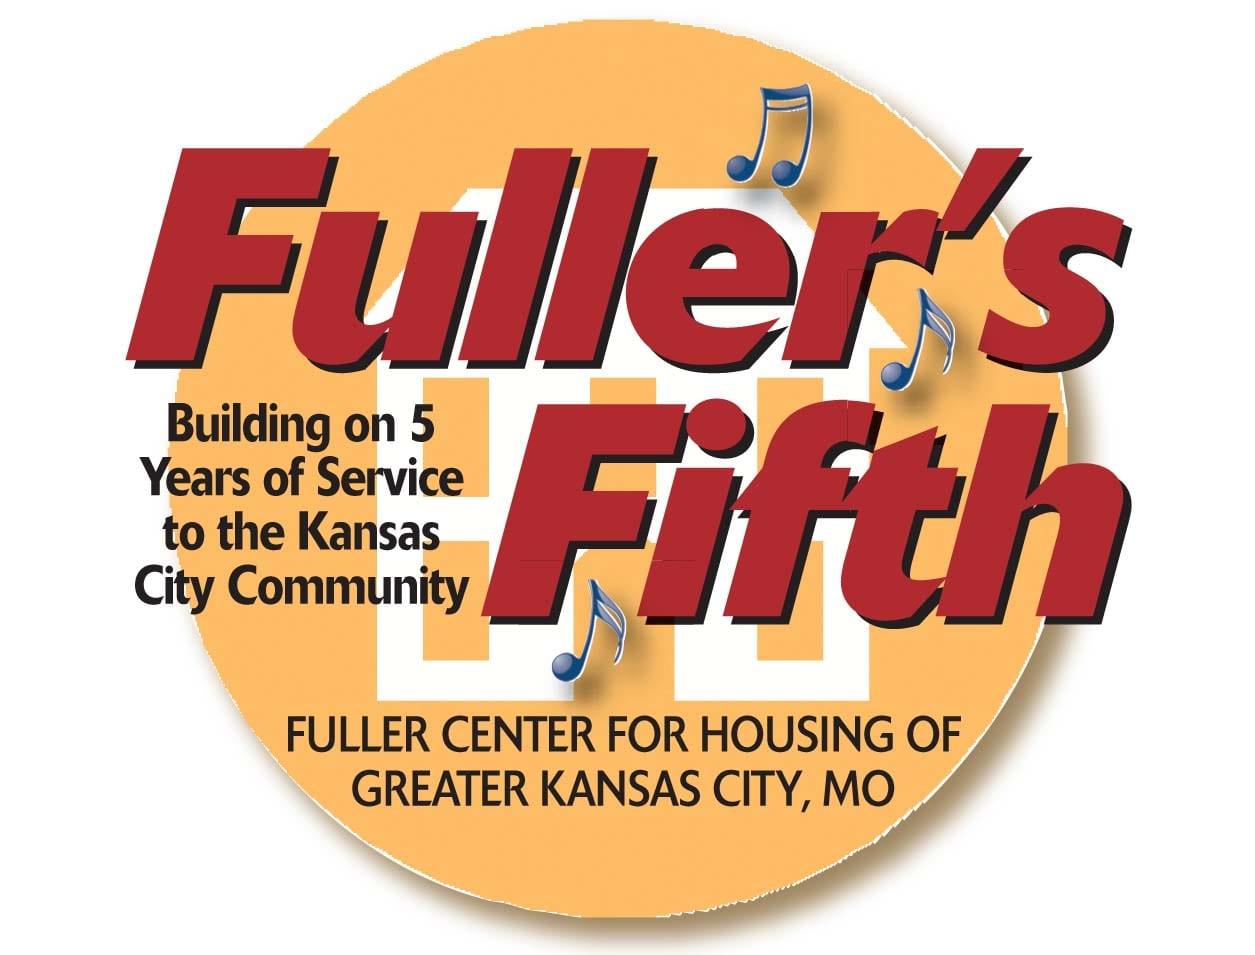 Fuller Center for Housing of Greater Fifth Annual Kansas City BBQ, Benefit & Celebration